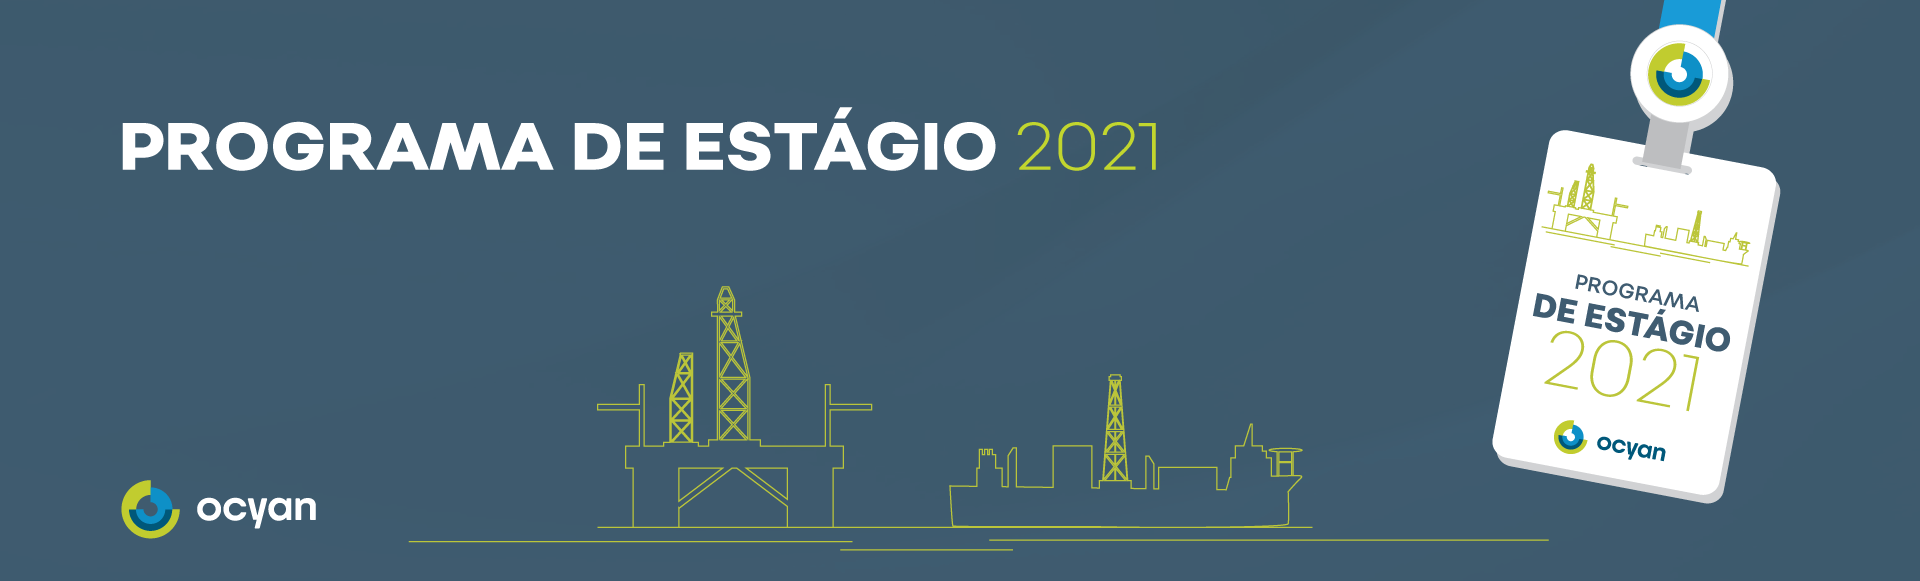 Programa de Estágio 2021 - Rio de Janeiro